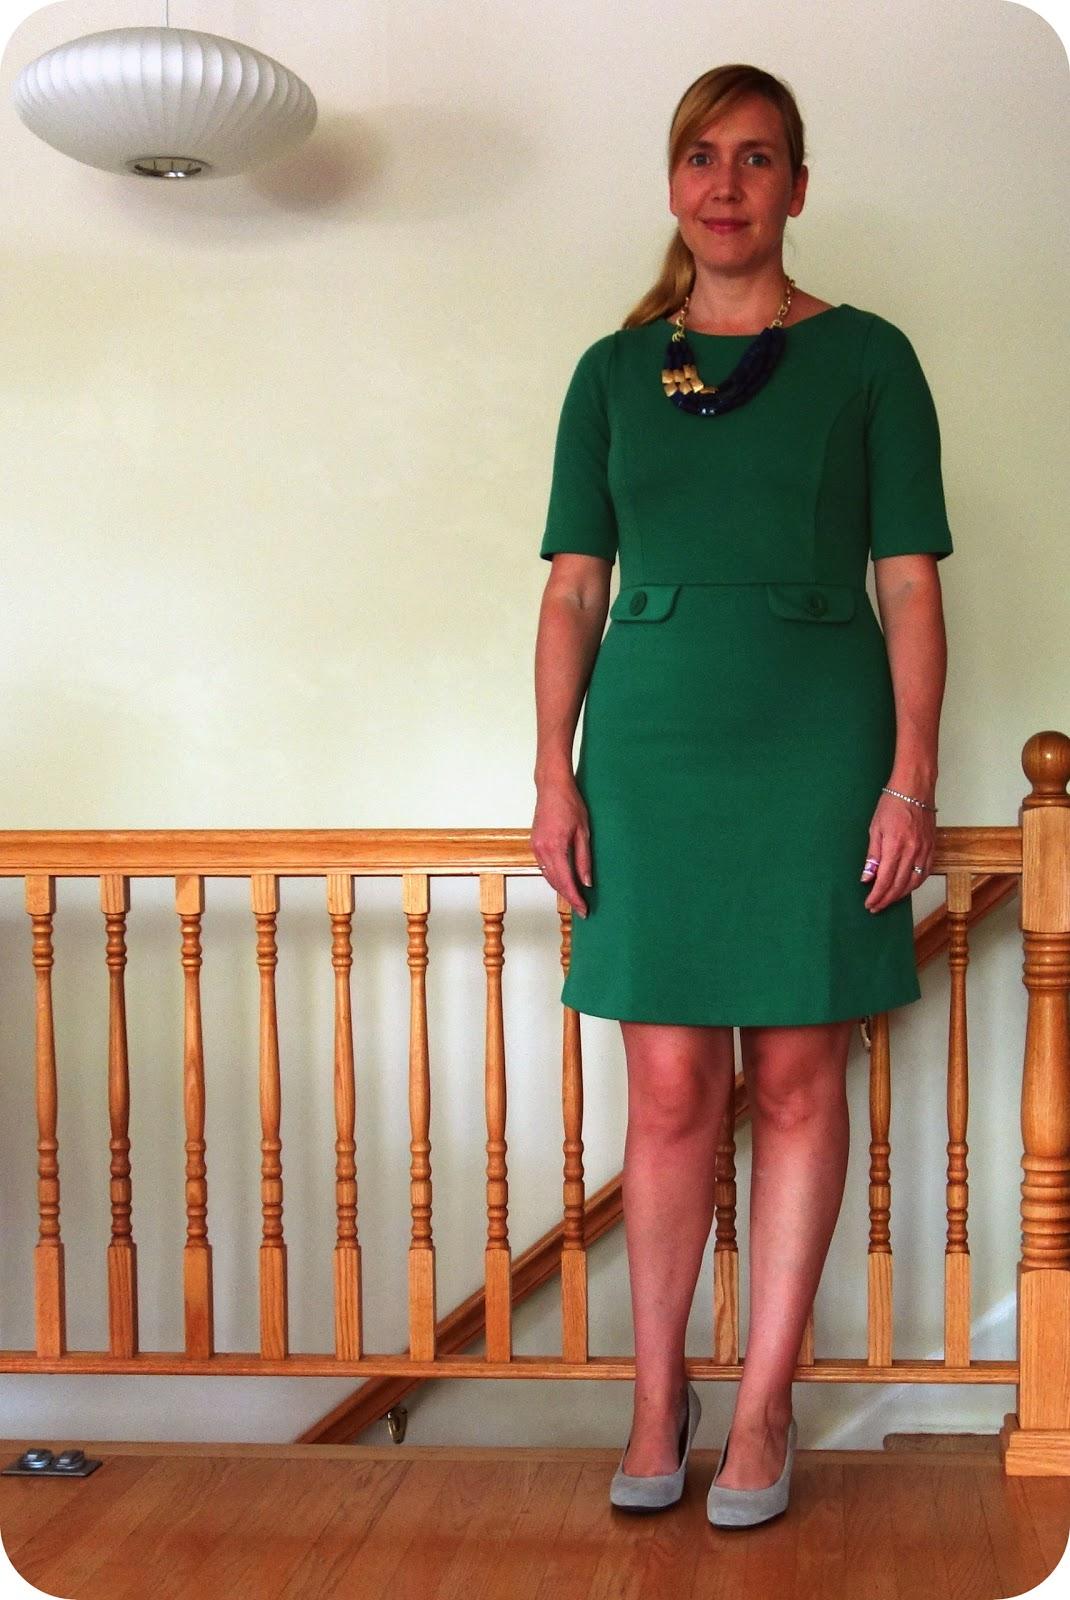 Frivolous dress order the straps